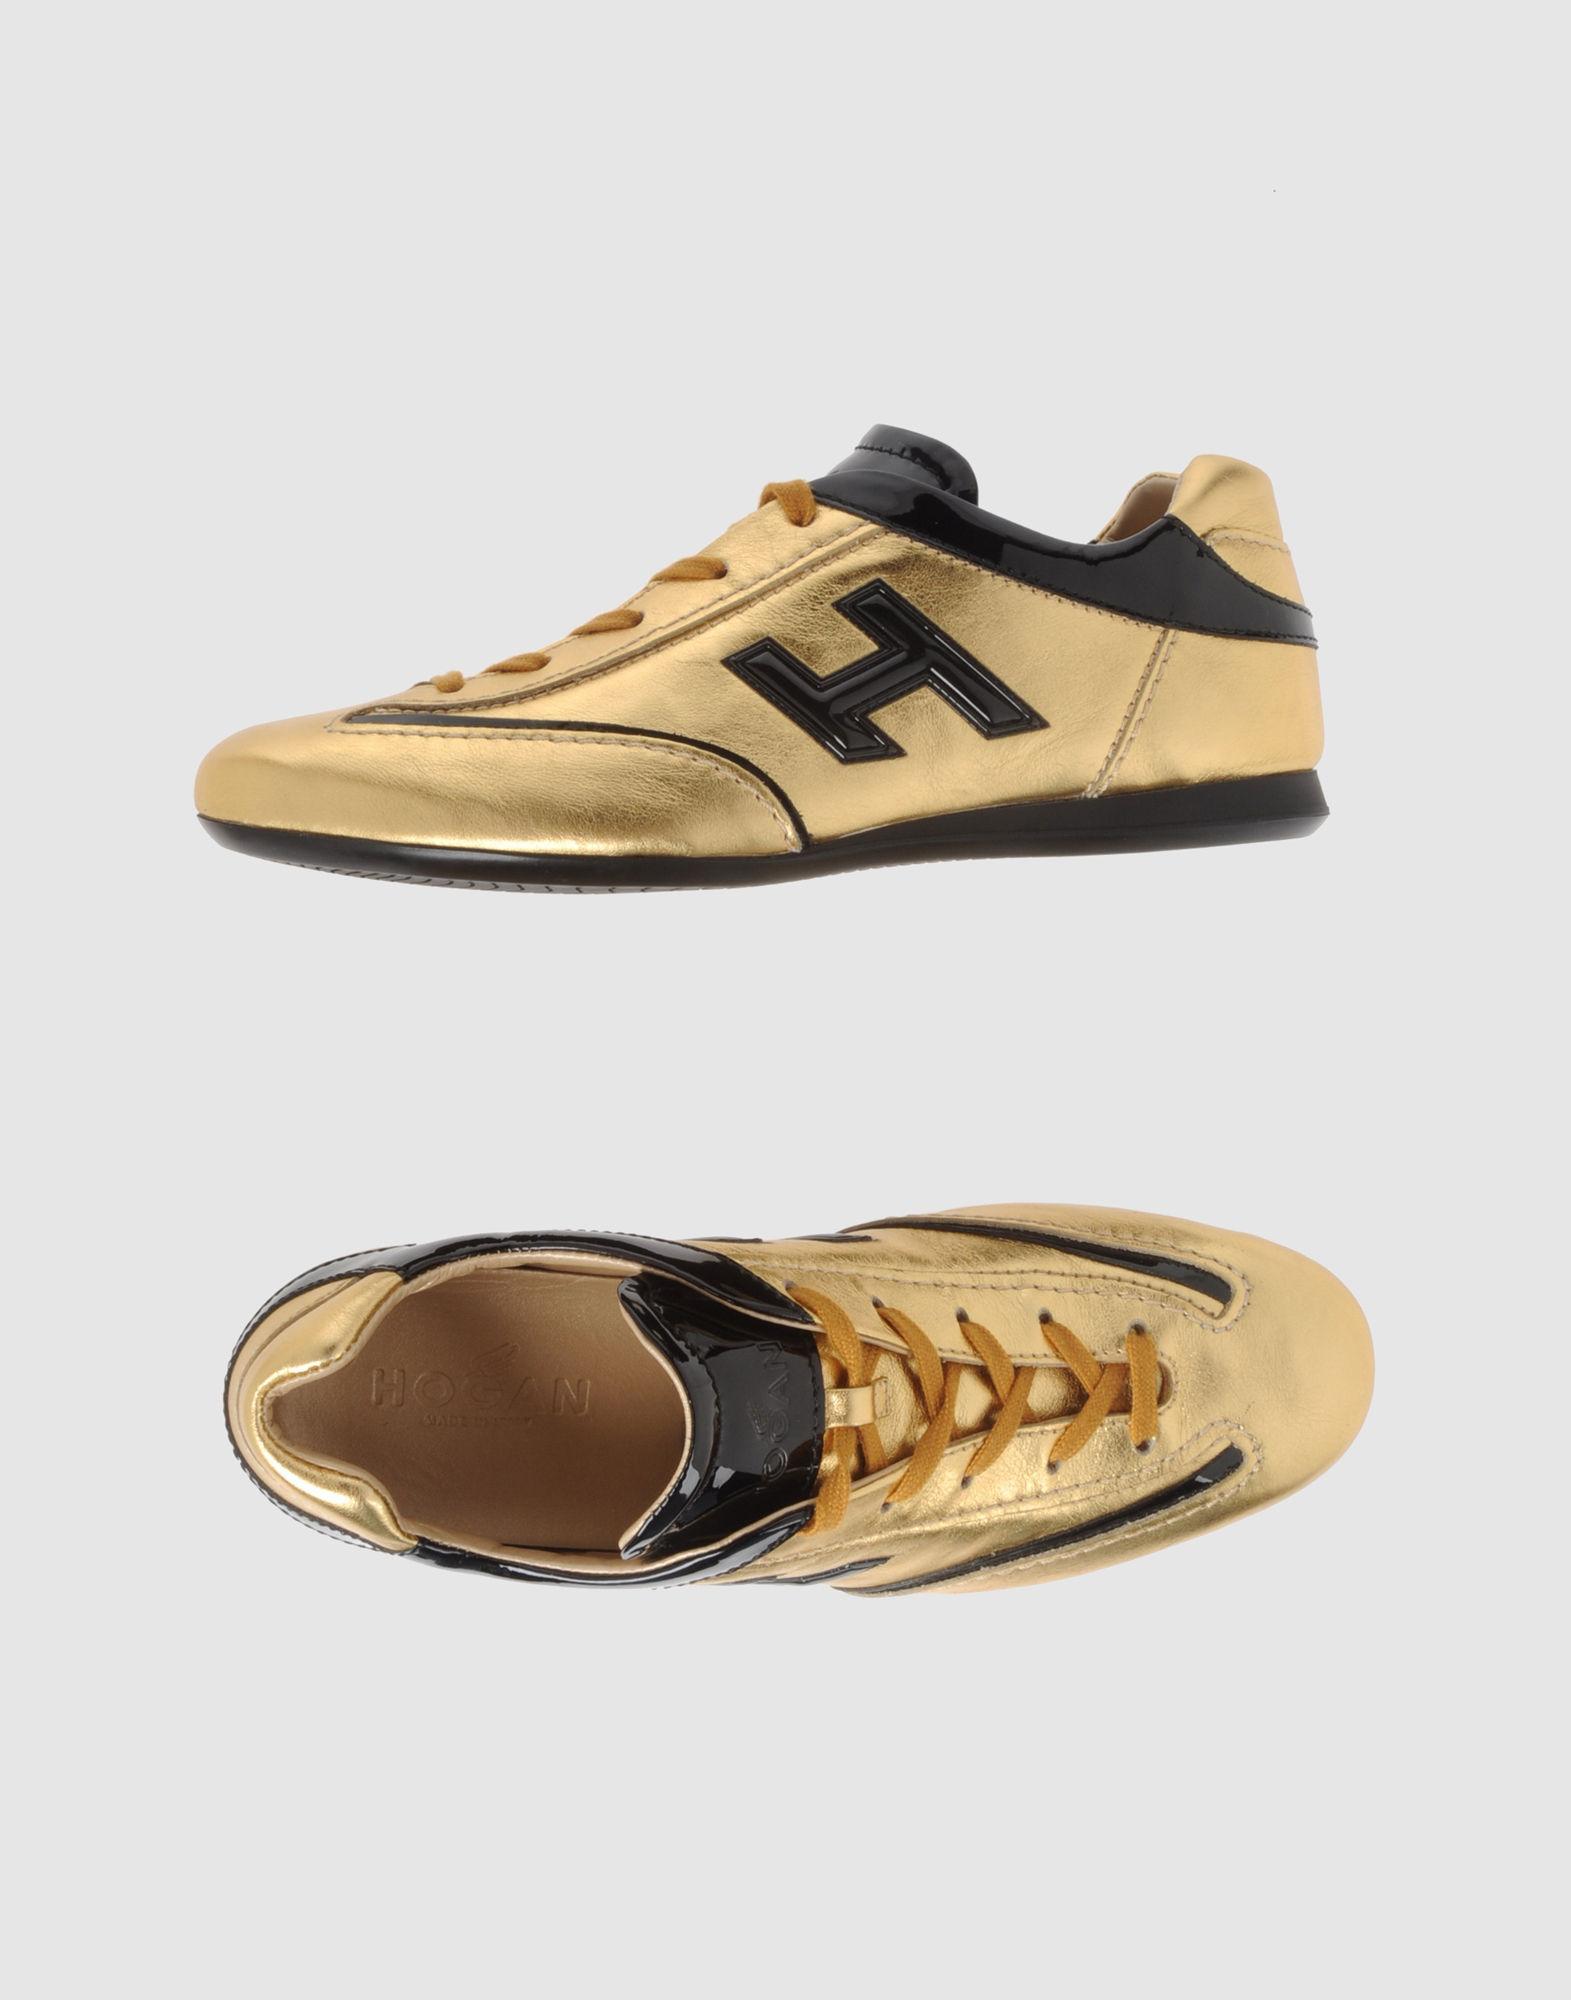 scarpe hogan non originali